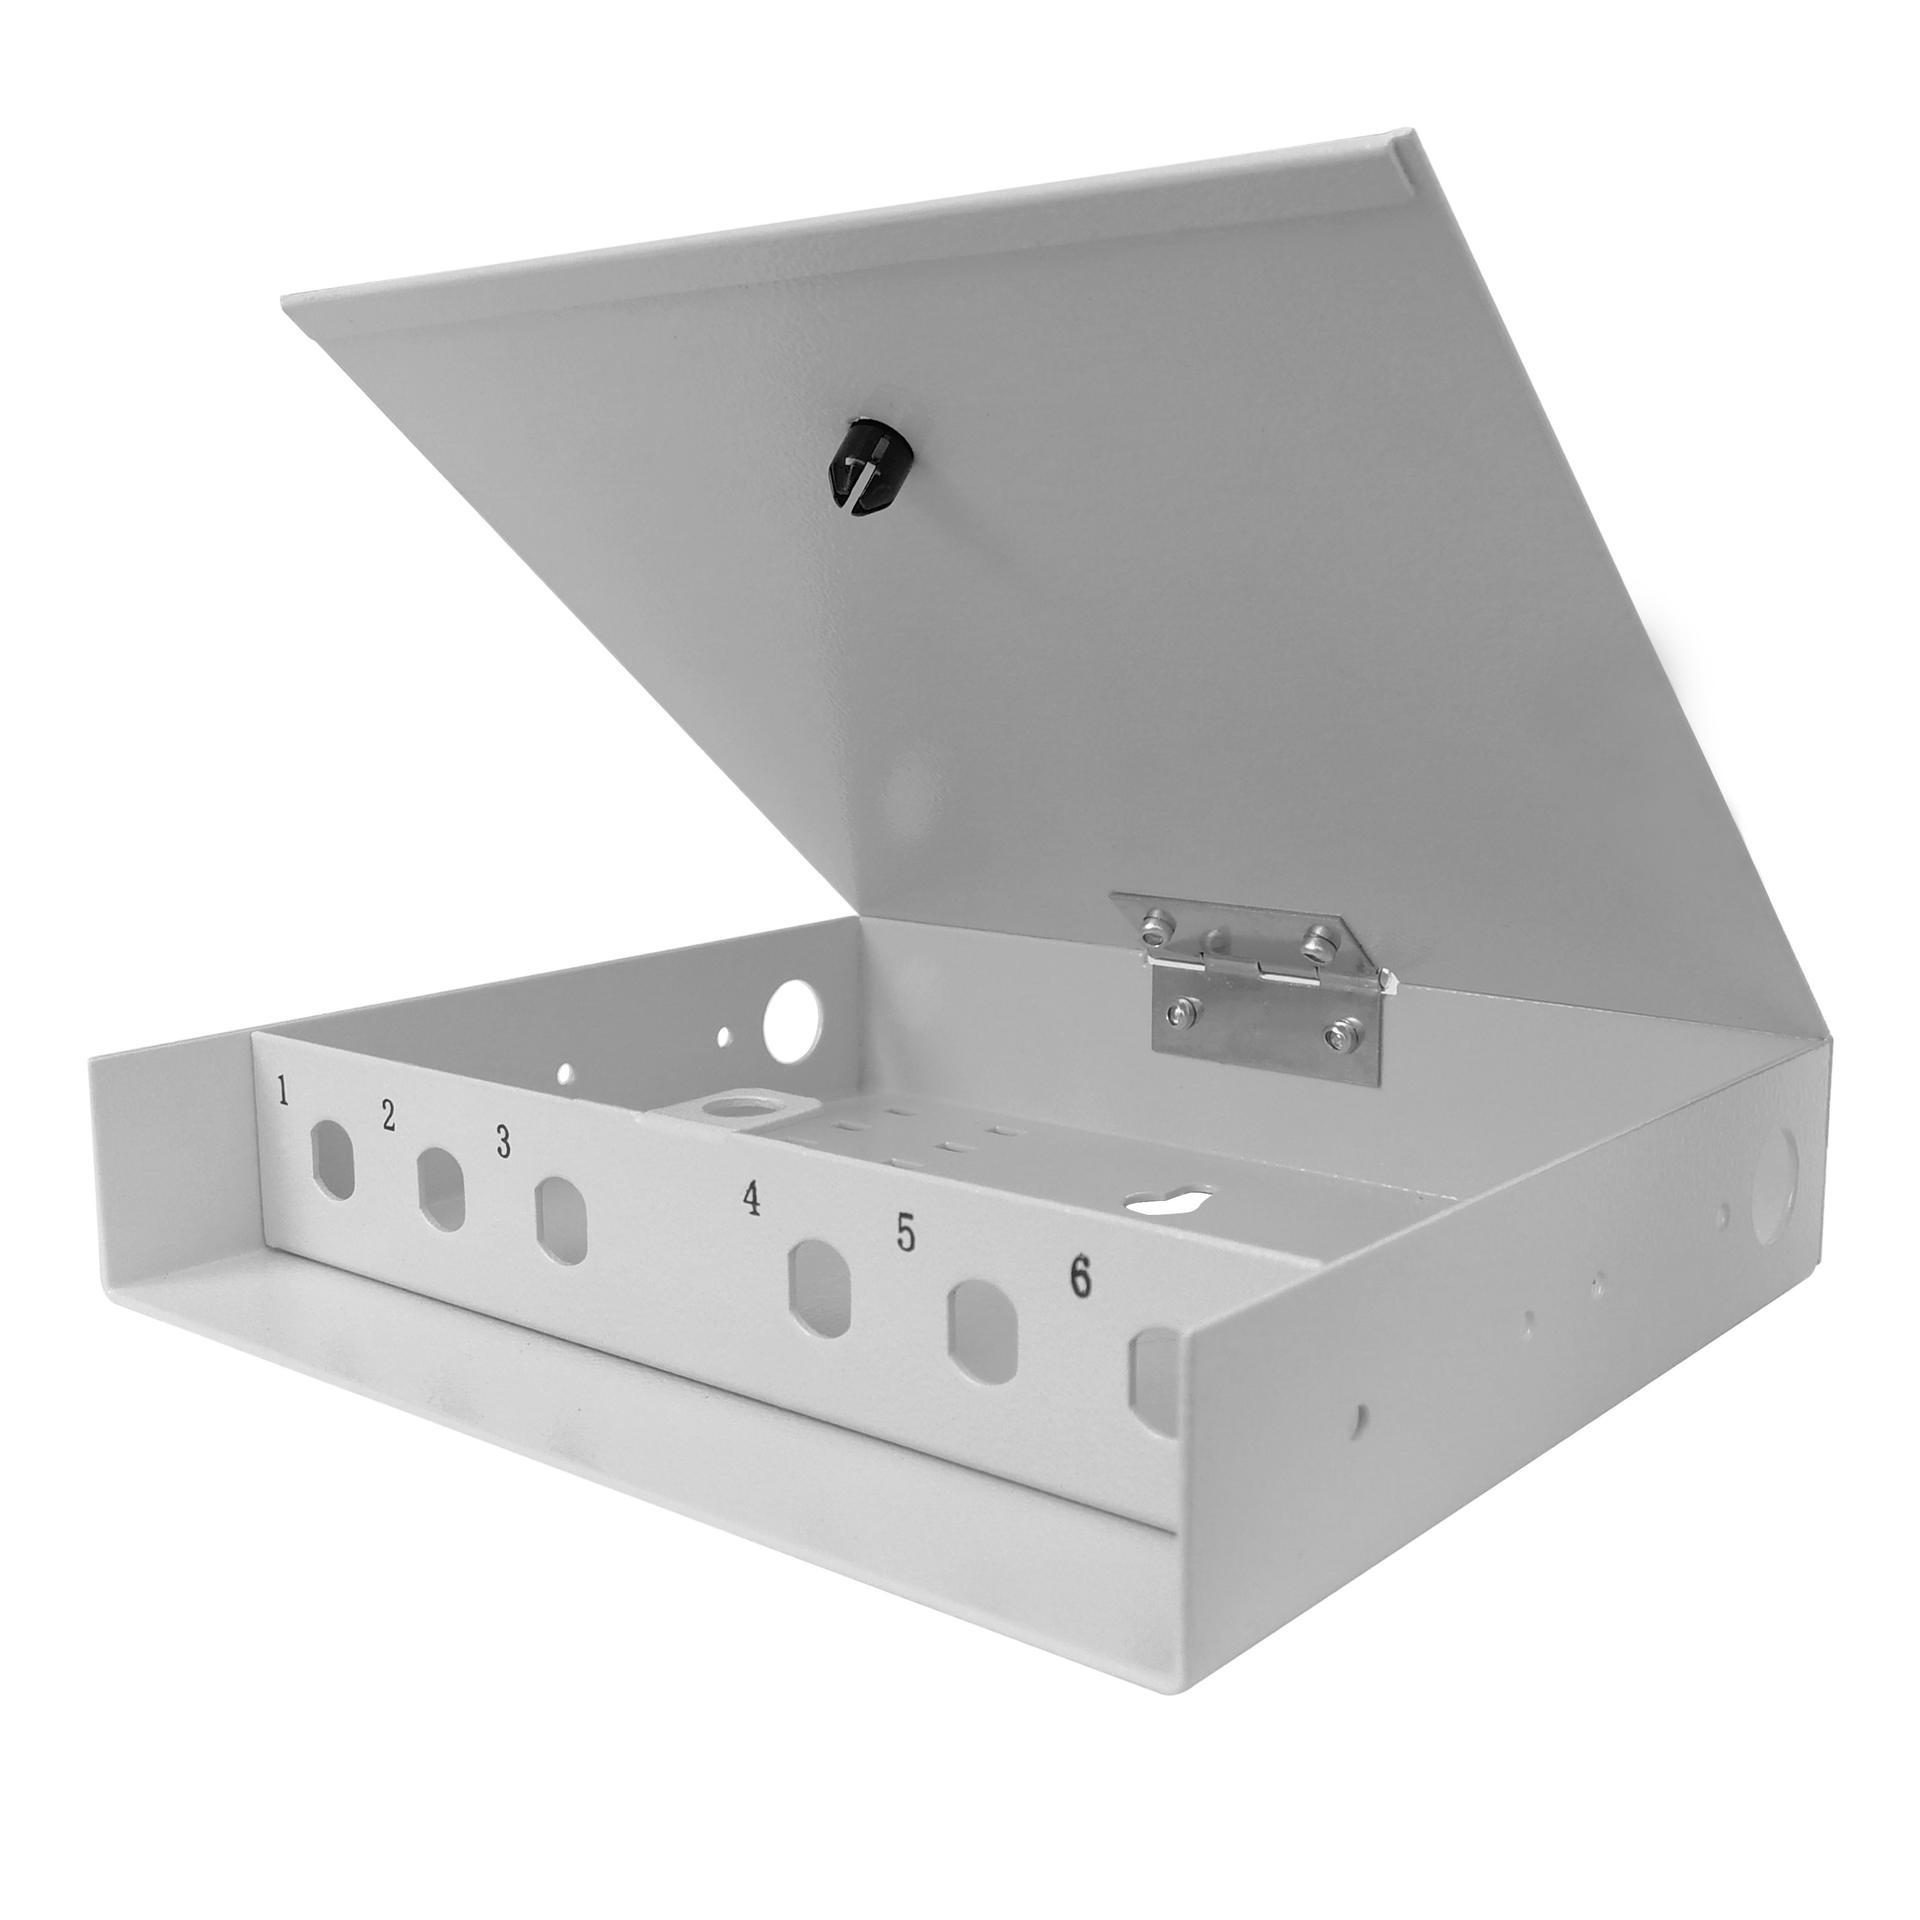 6 Port WODF Fiber Optic Distribution Box, ST Simplex